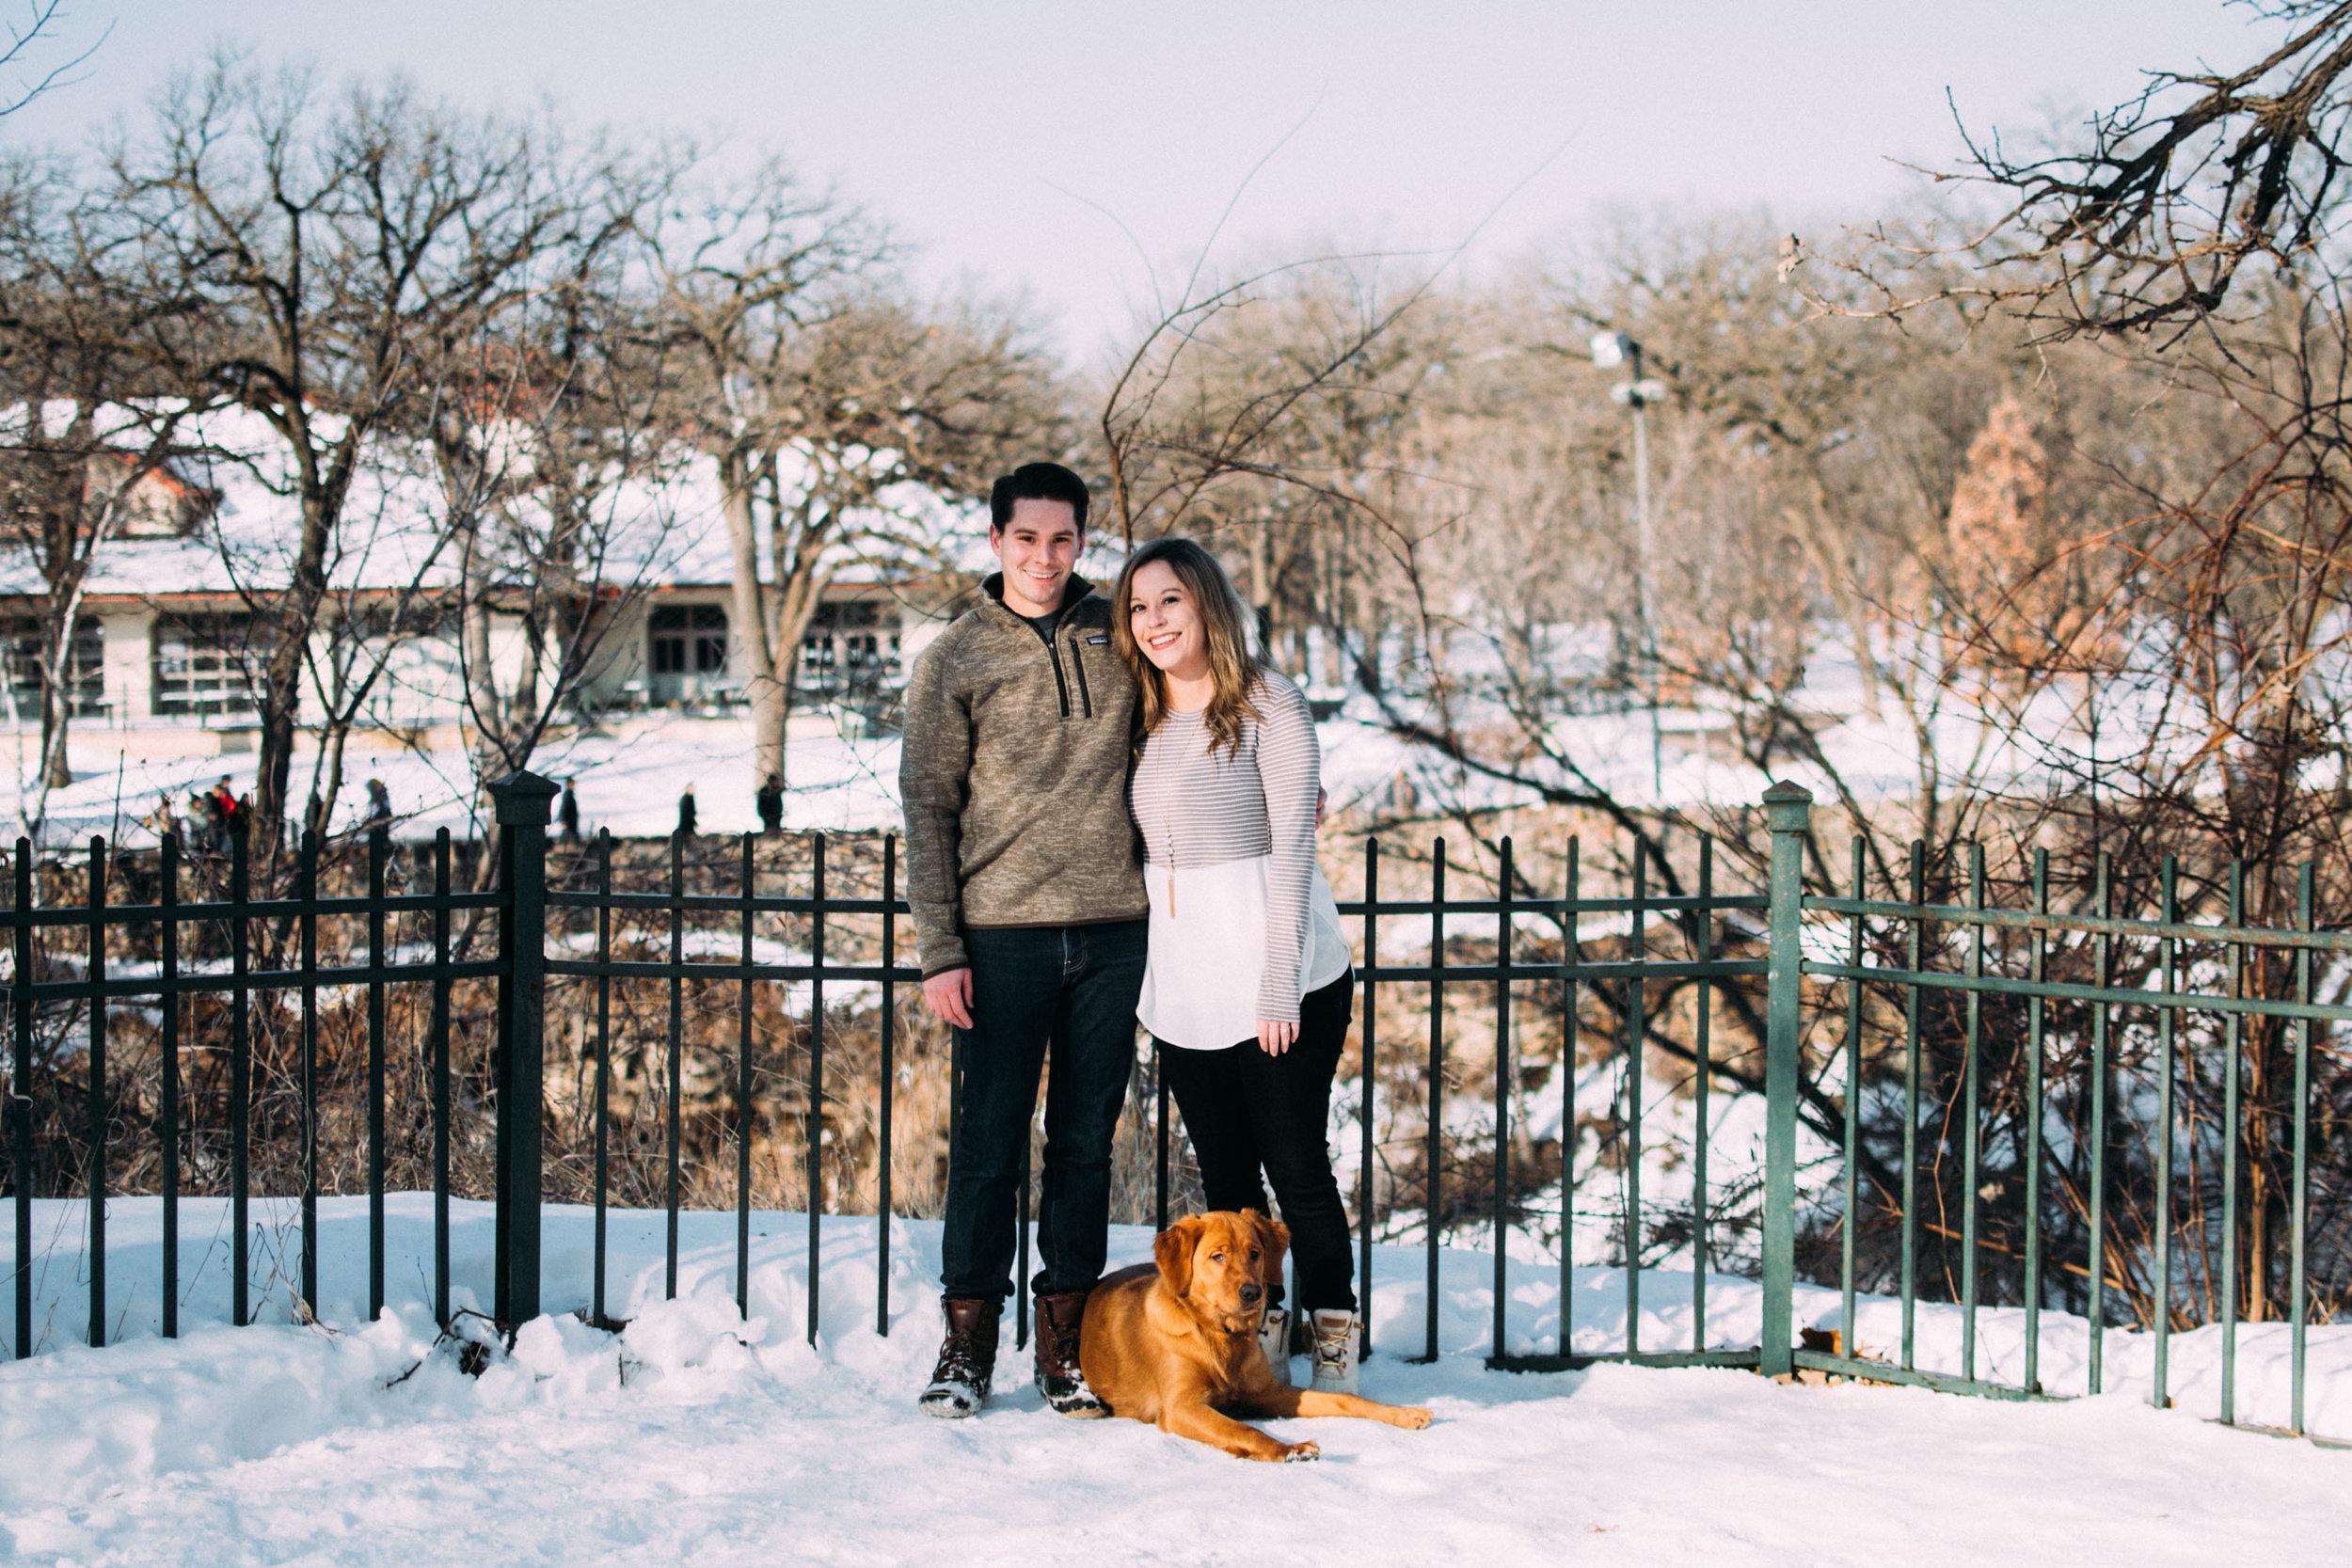 7-Dogs_at_Engagement_Photos_Minnesota.jpg